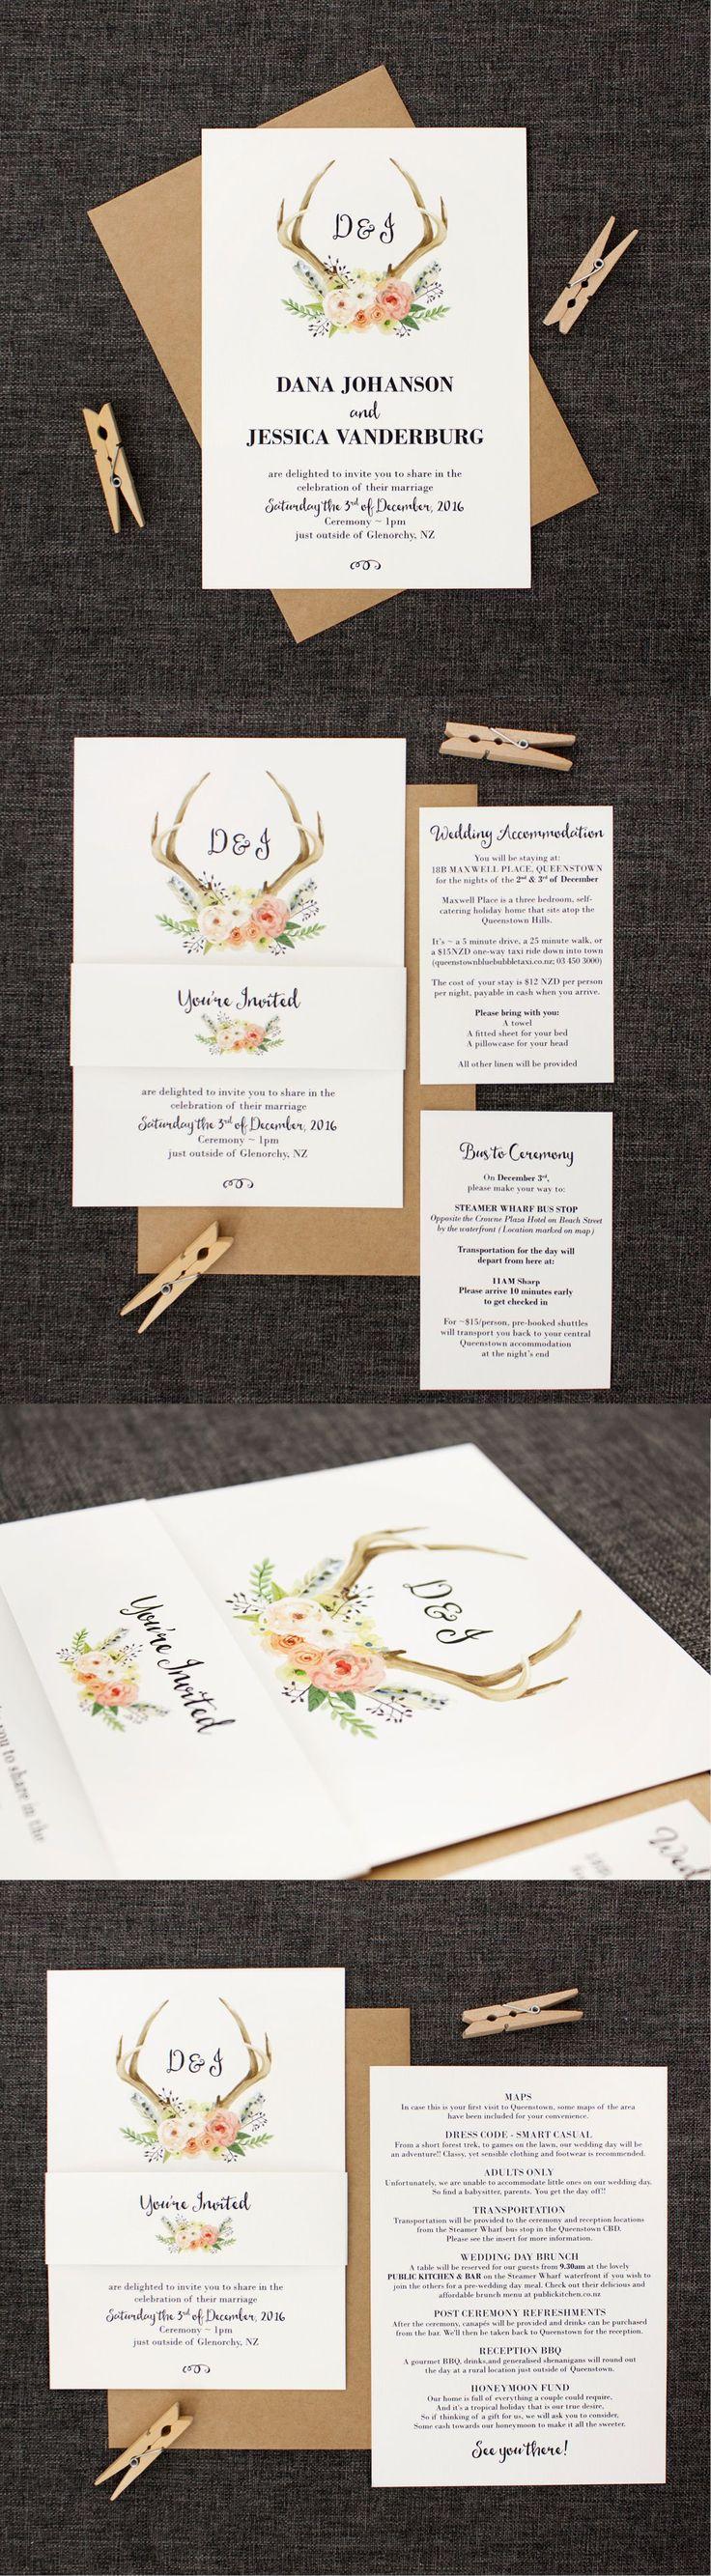 wedding invitation templates in telugu%0A Watercolour Deer Antlers and Flowers Wedding Invitation for a rustic  country wedding  weddinginvitation